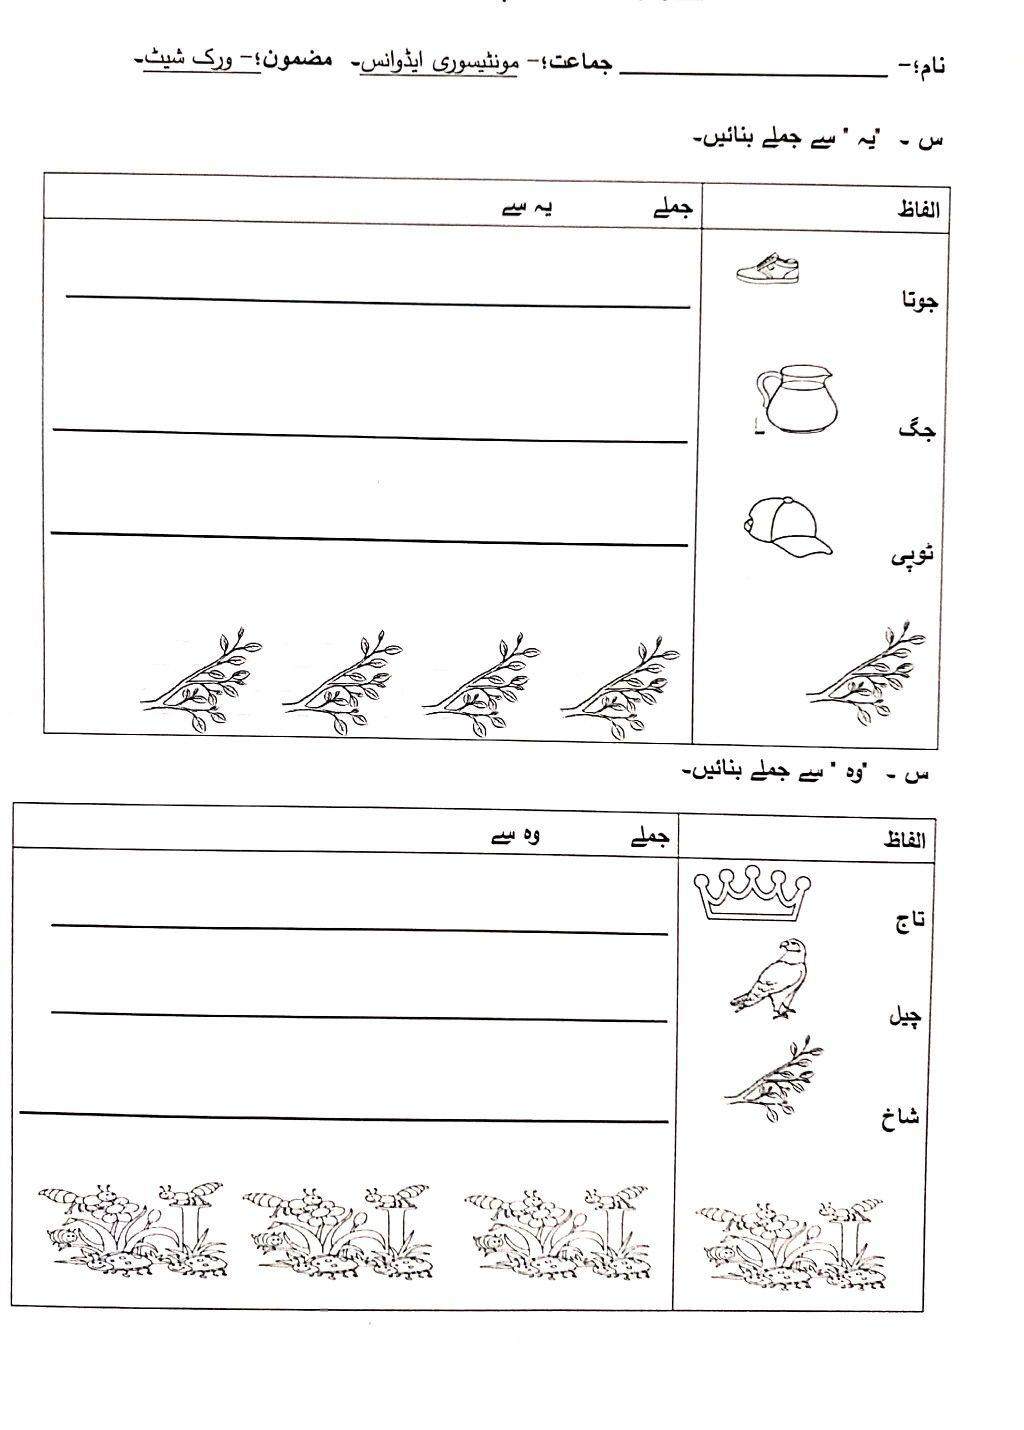 hight resolution of Urdu 5th Grade Worksheet   Printable Worksheets and Activities for  Teachers